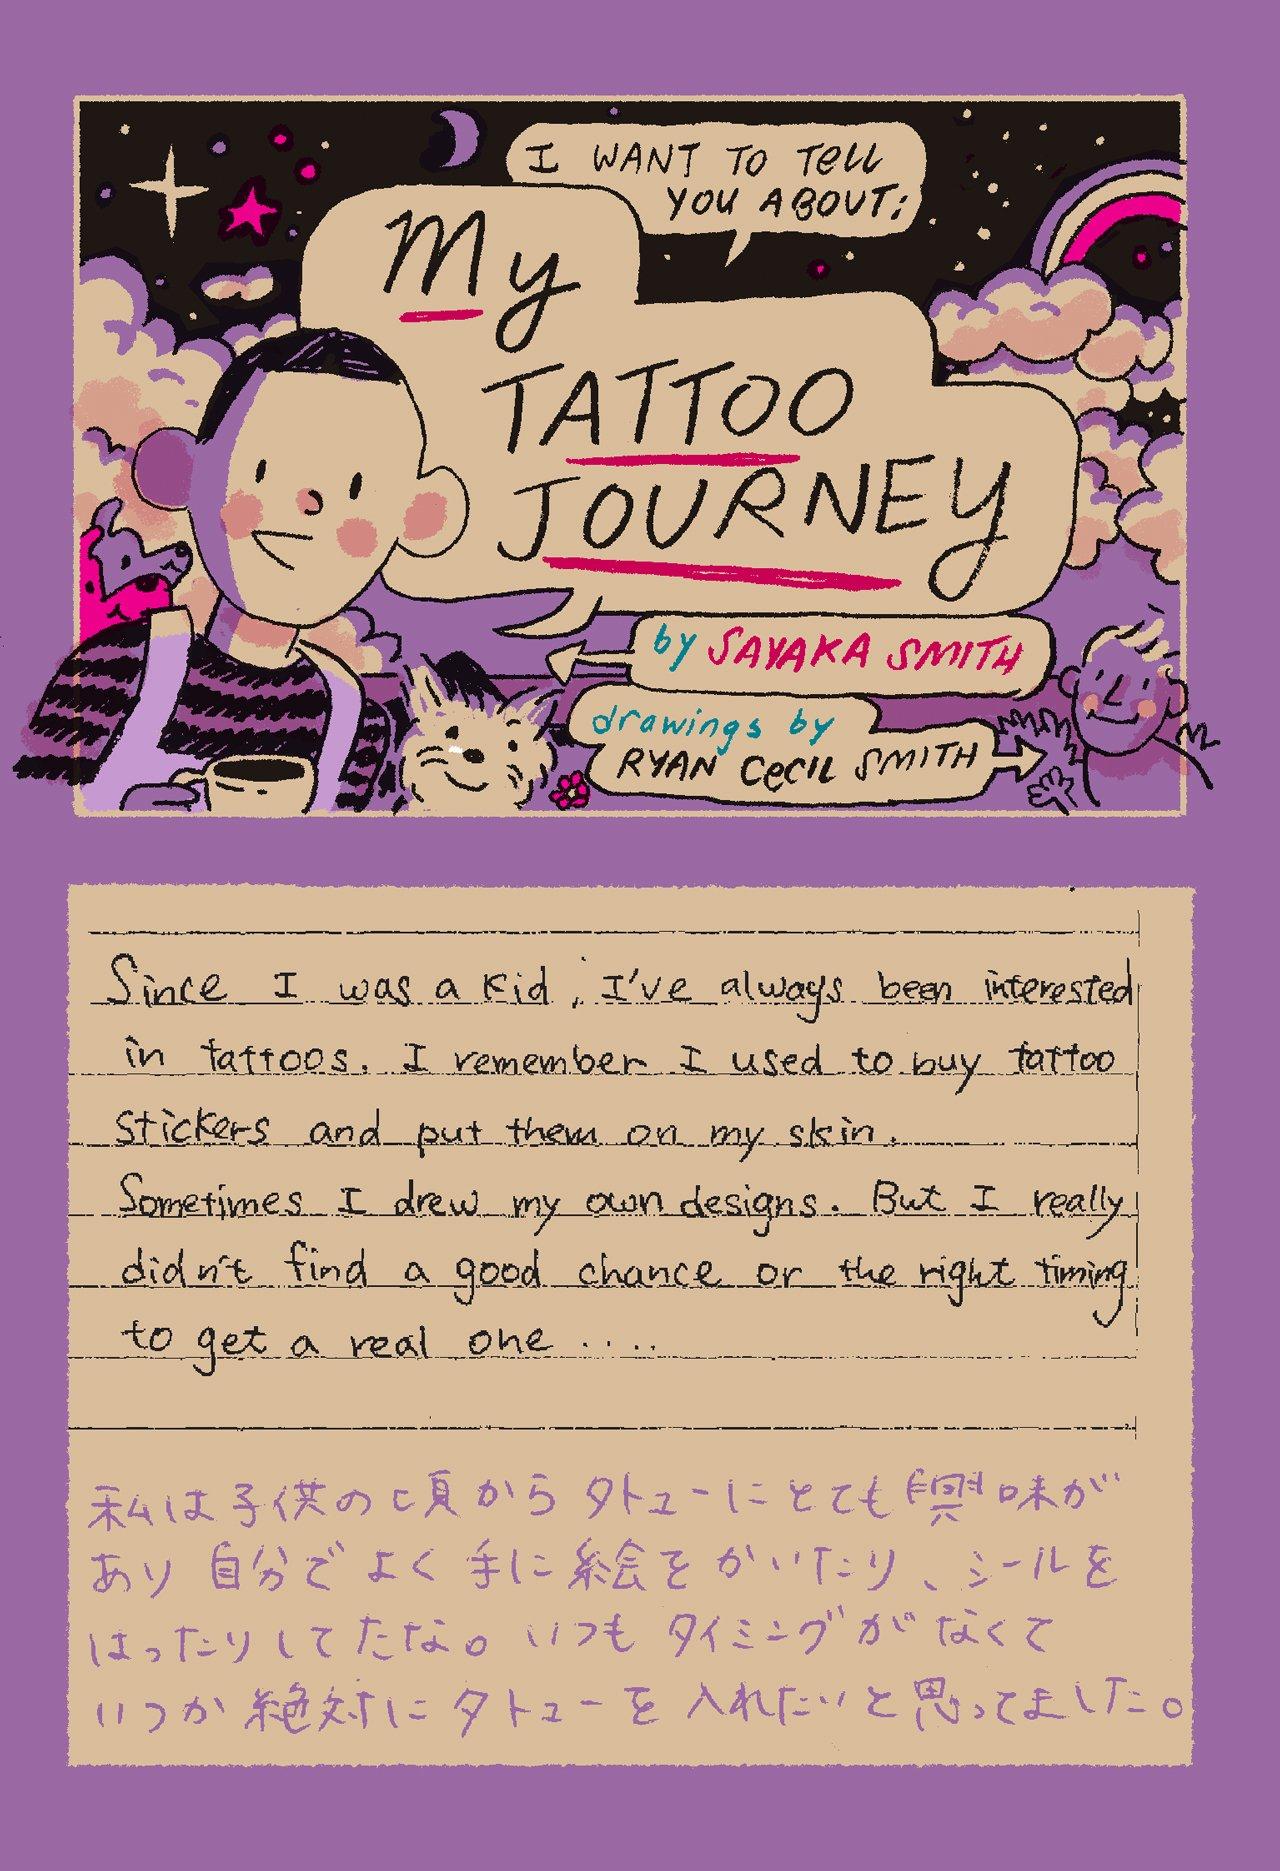 My Tattoo Journey